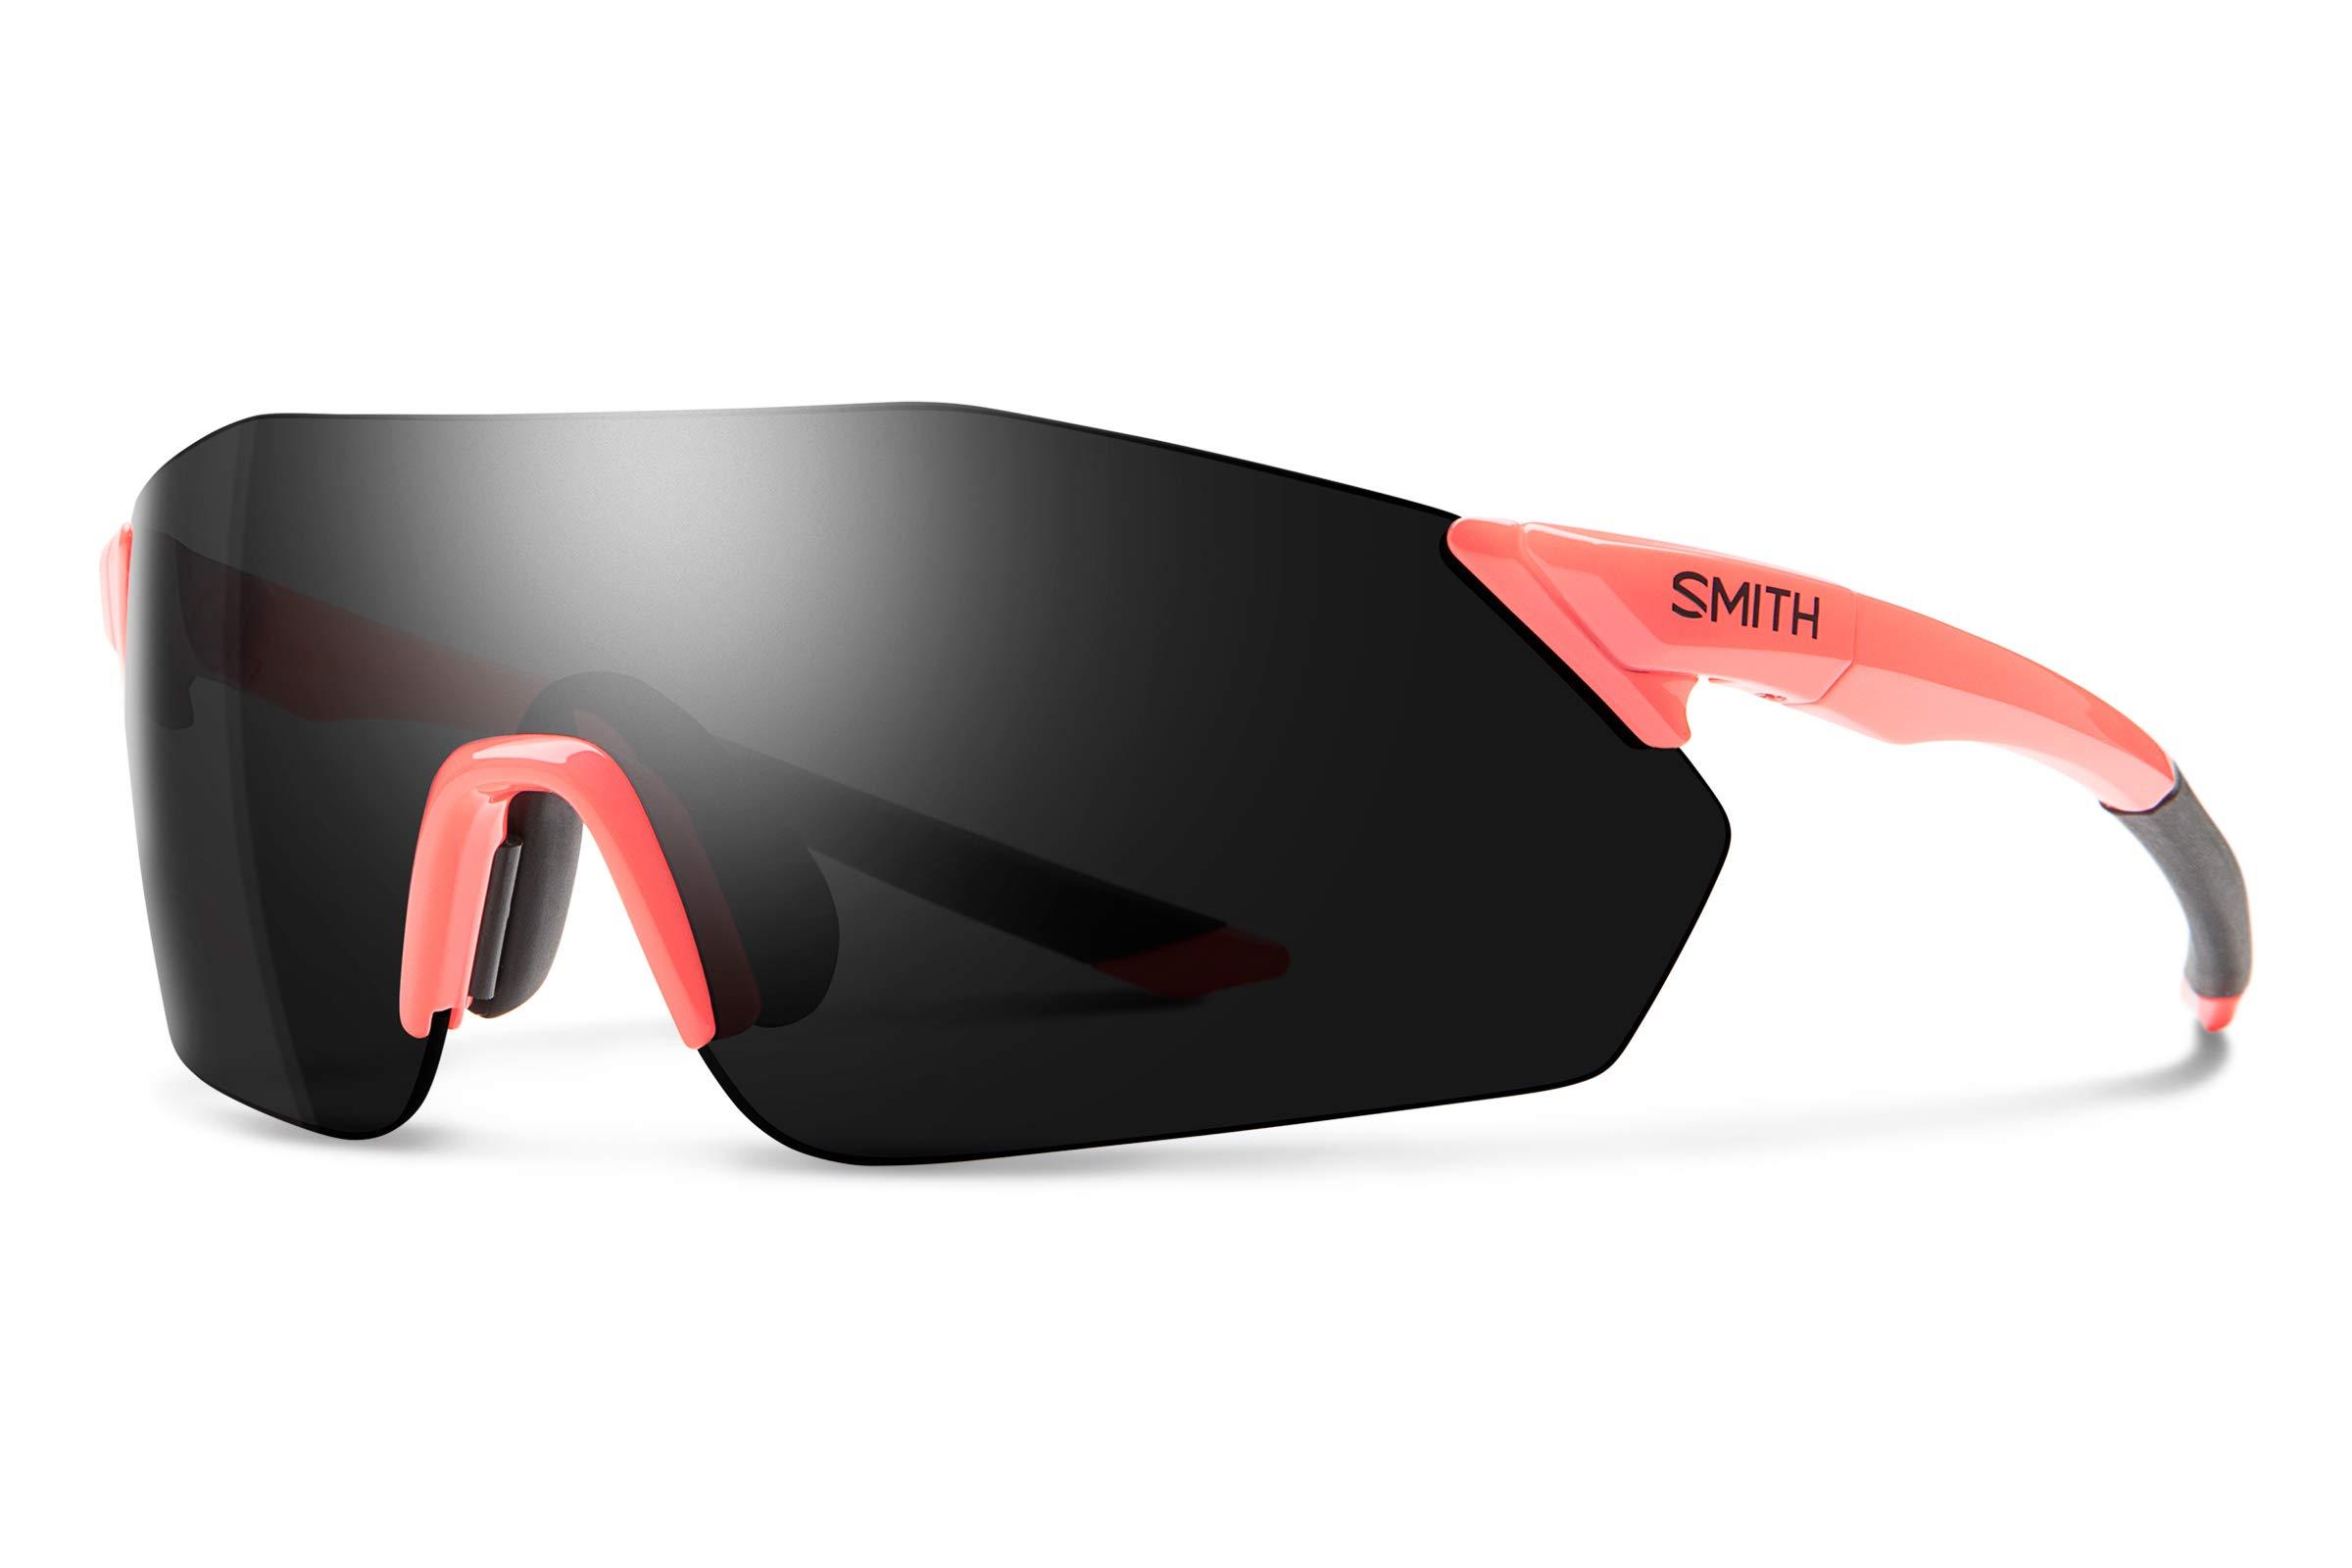 Smith Reverb Chromapop Sunglasses, Sunburst, Chromapop Sun Black/Contrast Rose